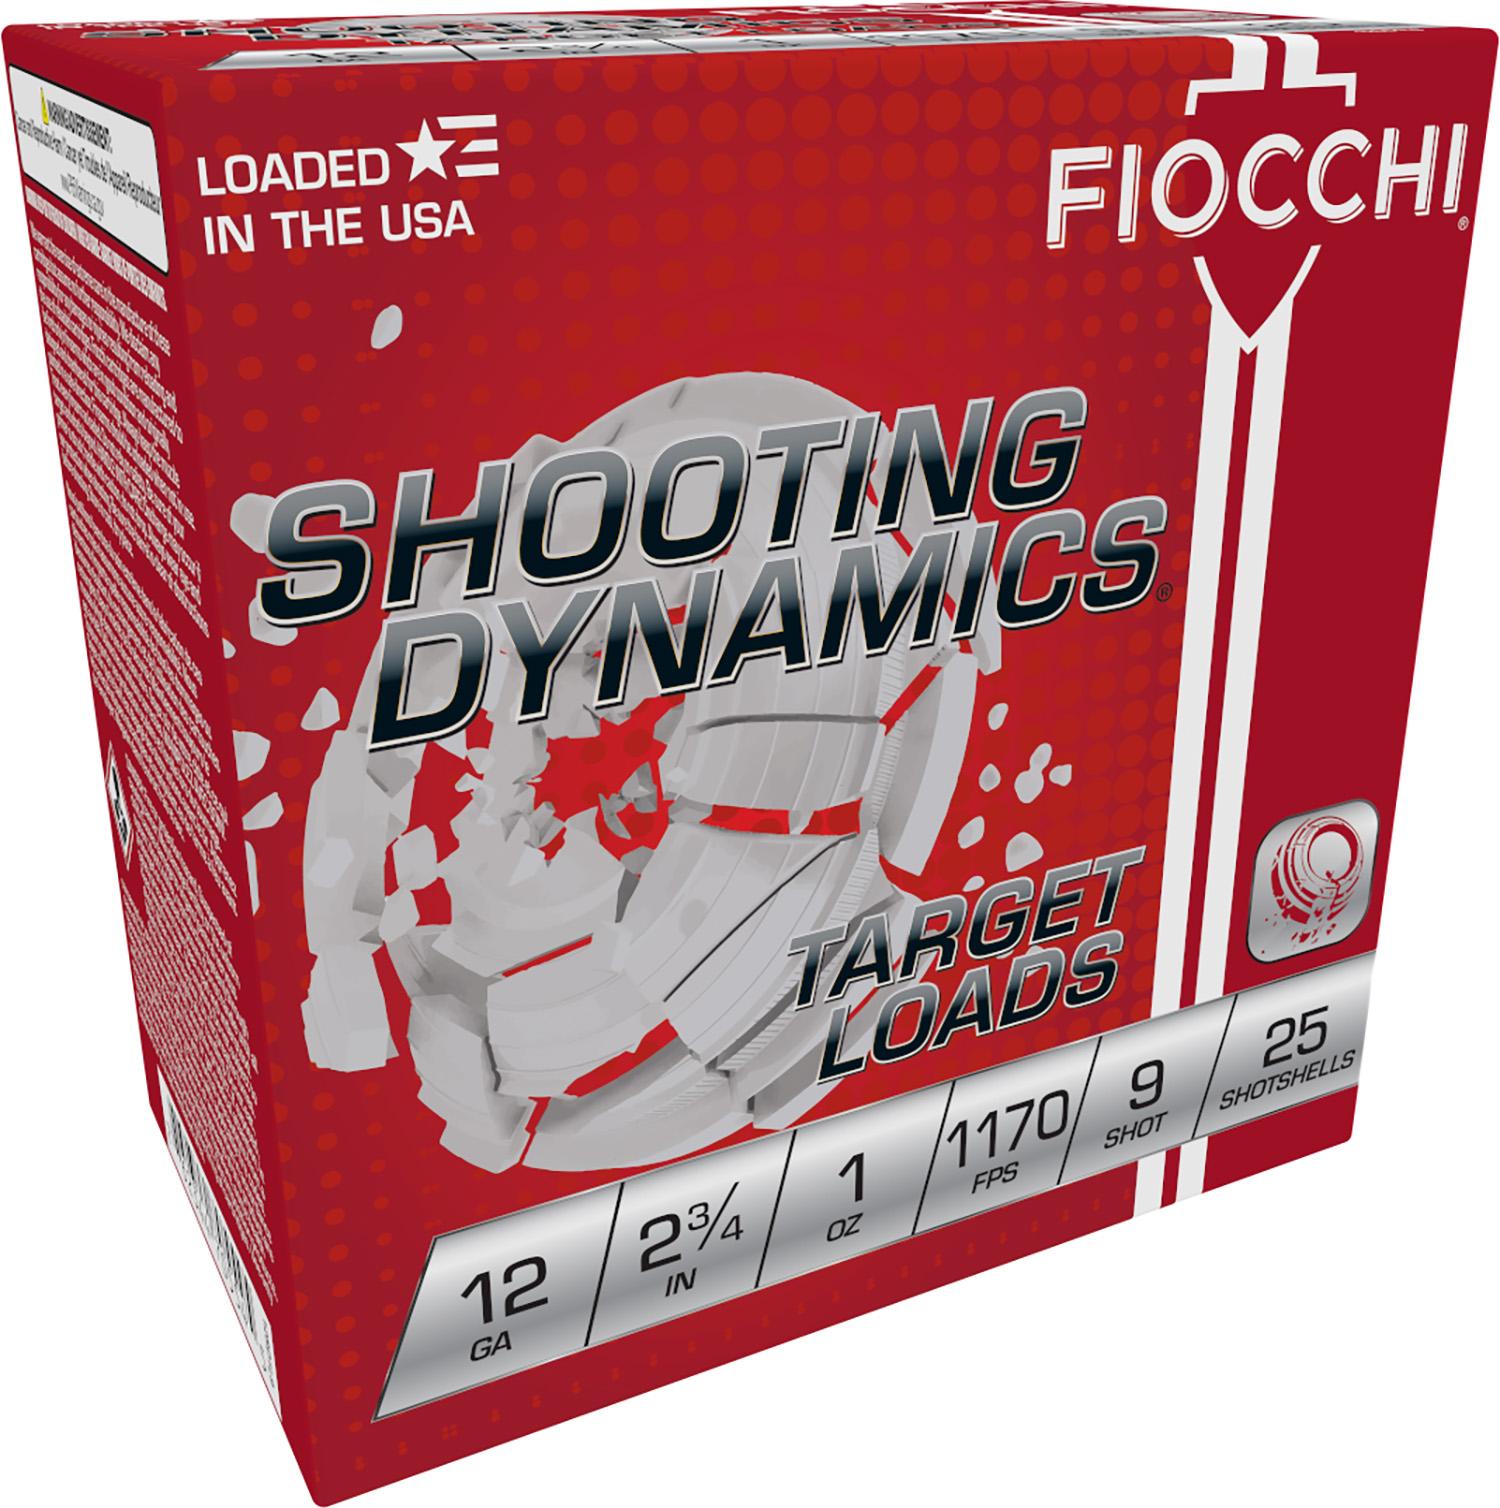 Fiocchi 12SD1L9 Shooting Dynamics Light Dynamic  12 Gauge 2.75